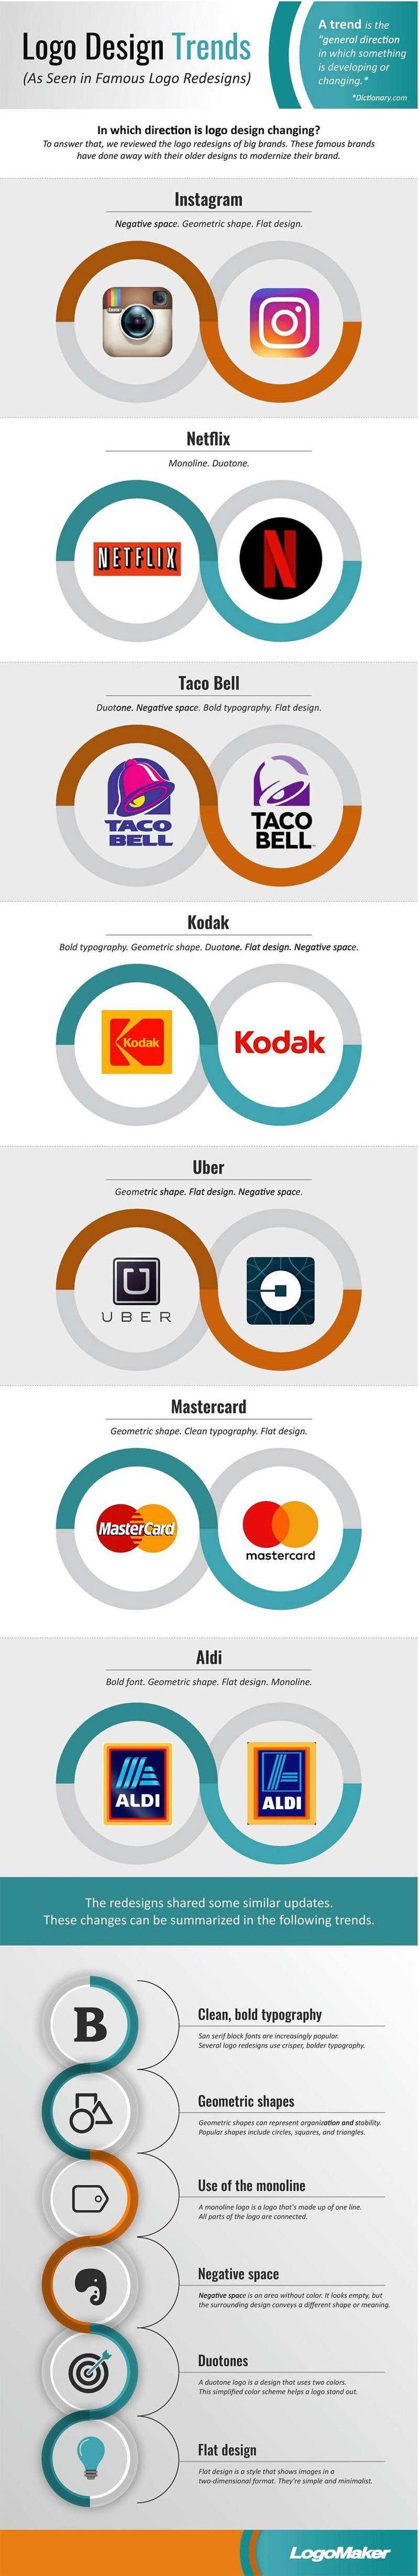 Logo Redesign Trends